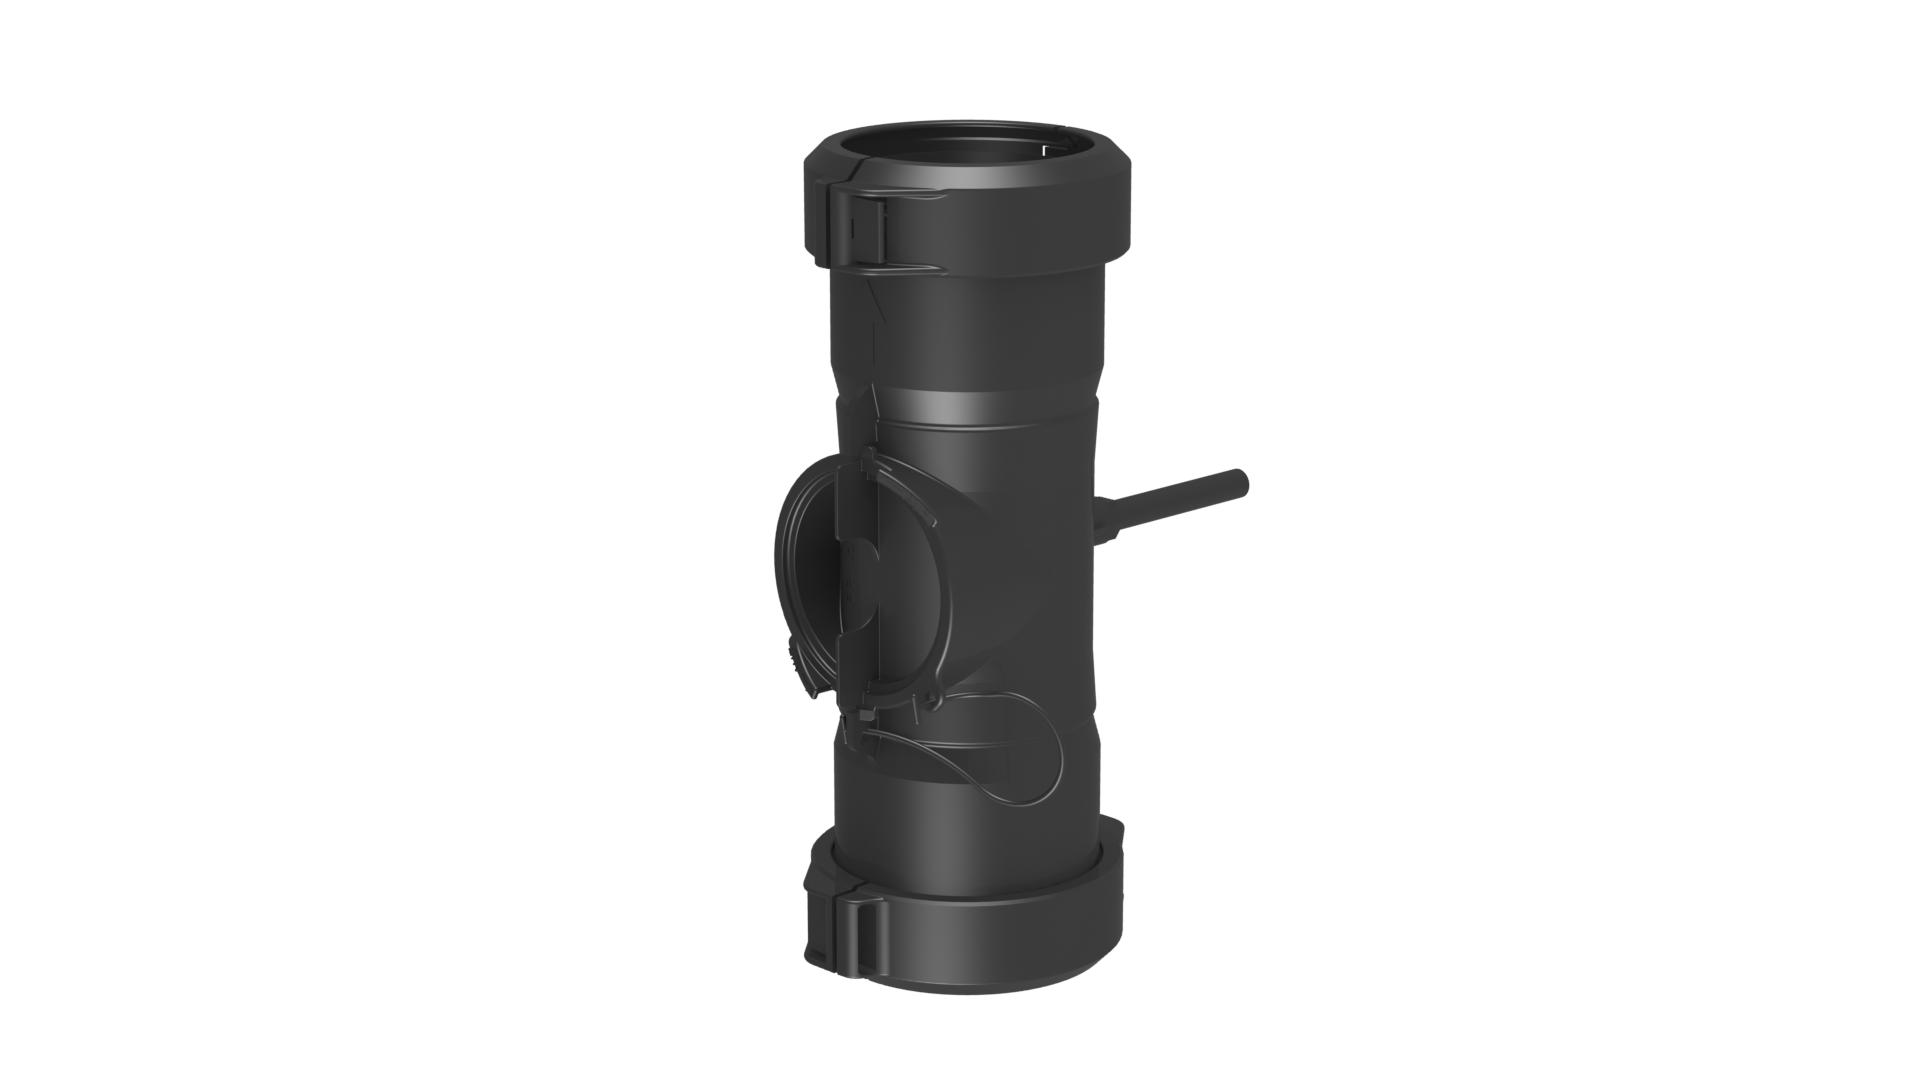 Inspektionselement - Kunststoff für Jeremias EW-PP-FLEX